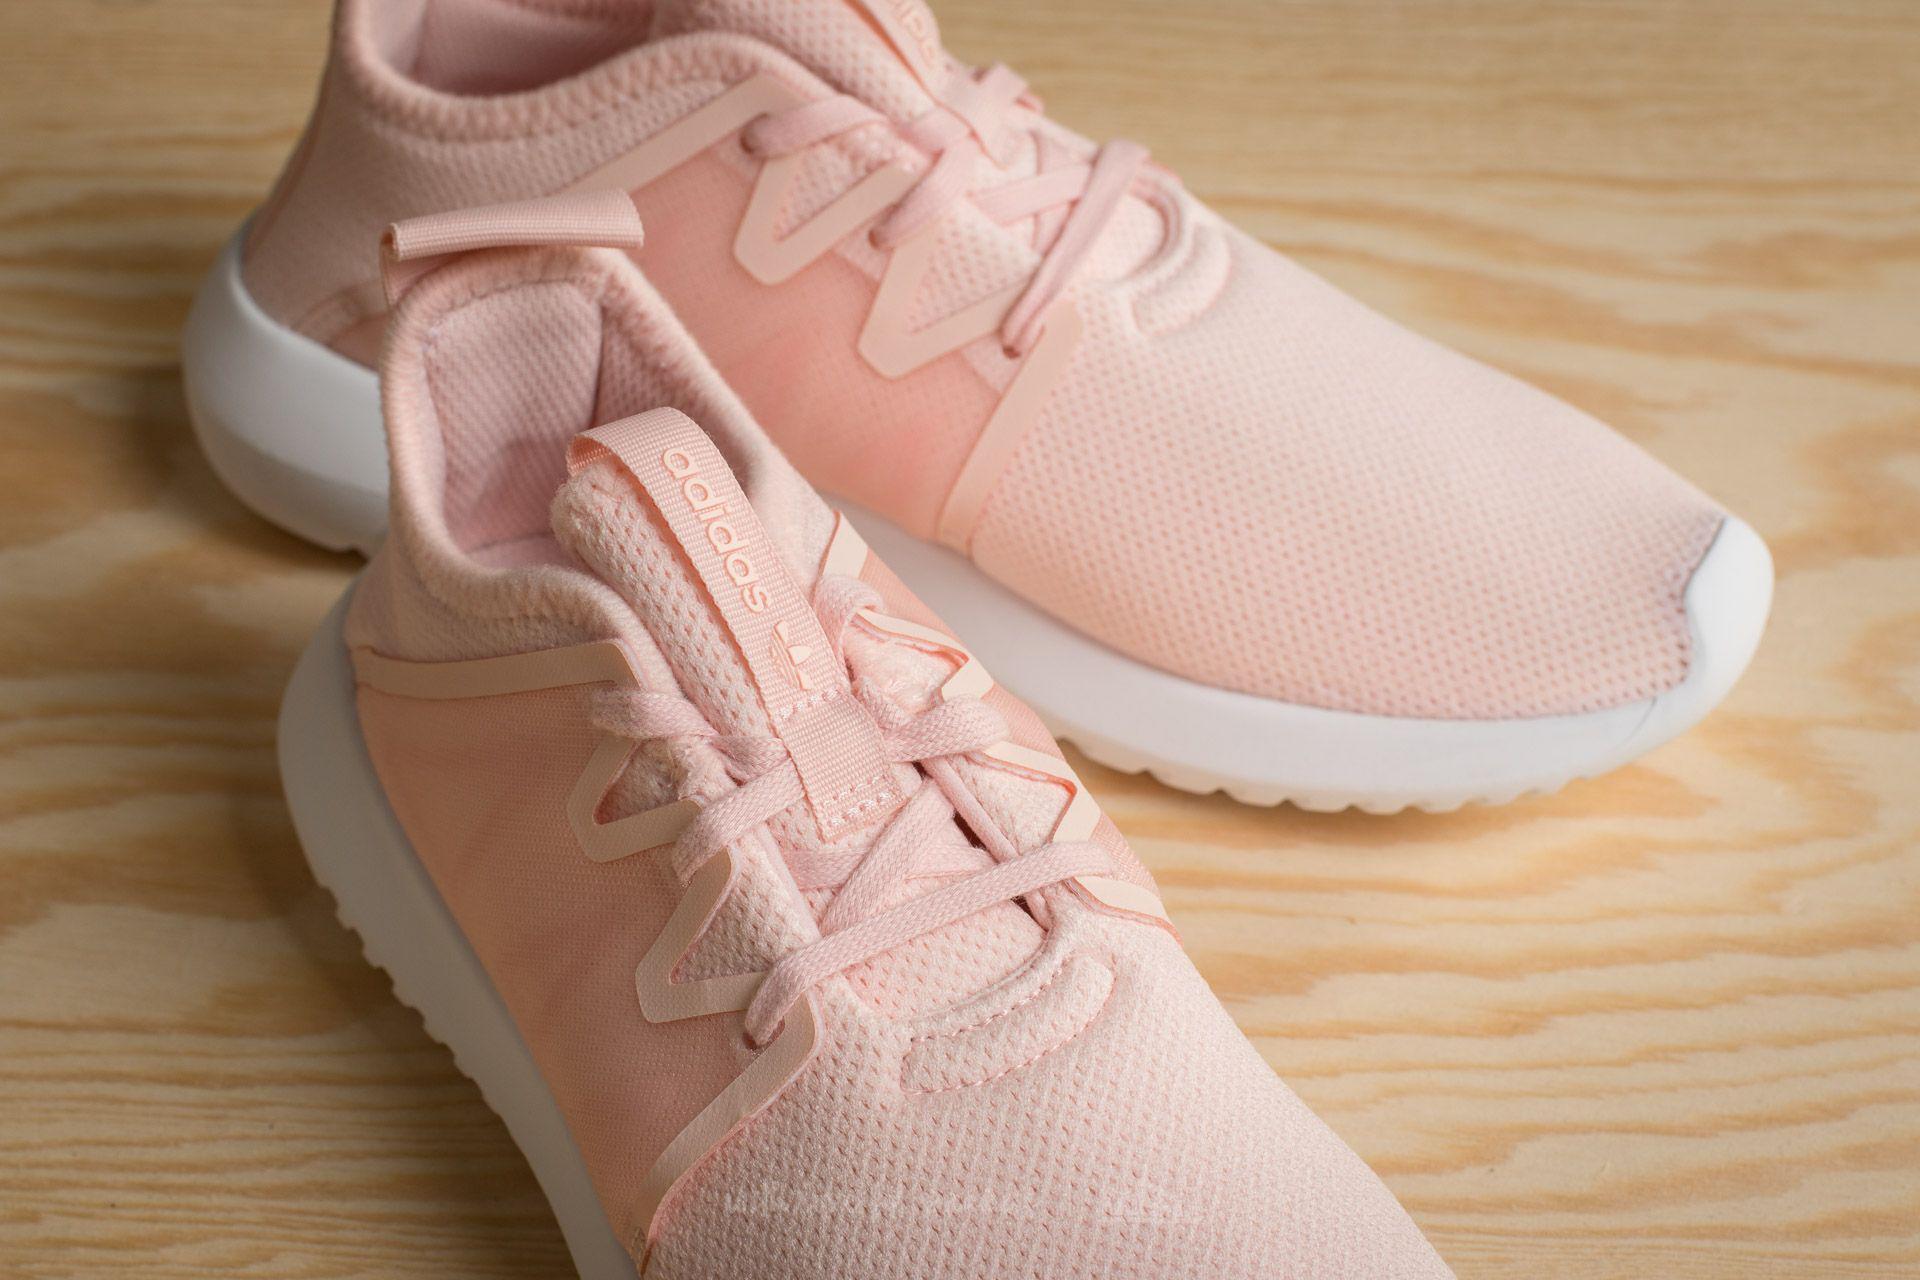 1337592c7289 Lyst - adidas Originals Adidas Tubular Viral 2.0 W Ice Pink  Ice ...